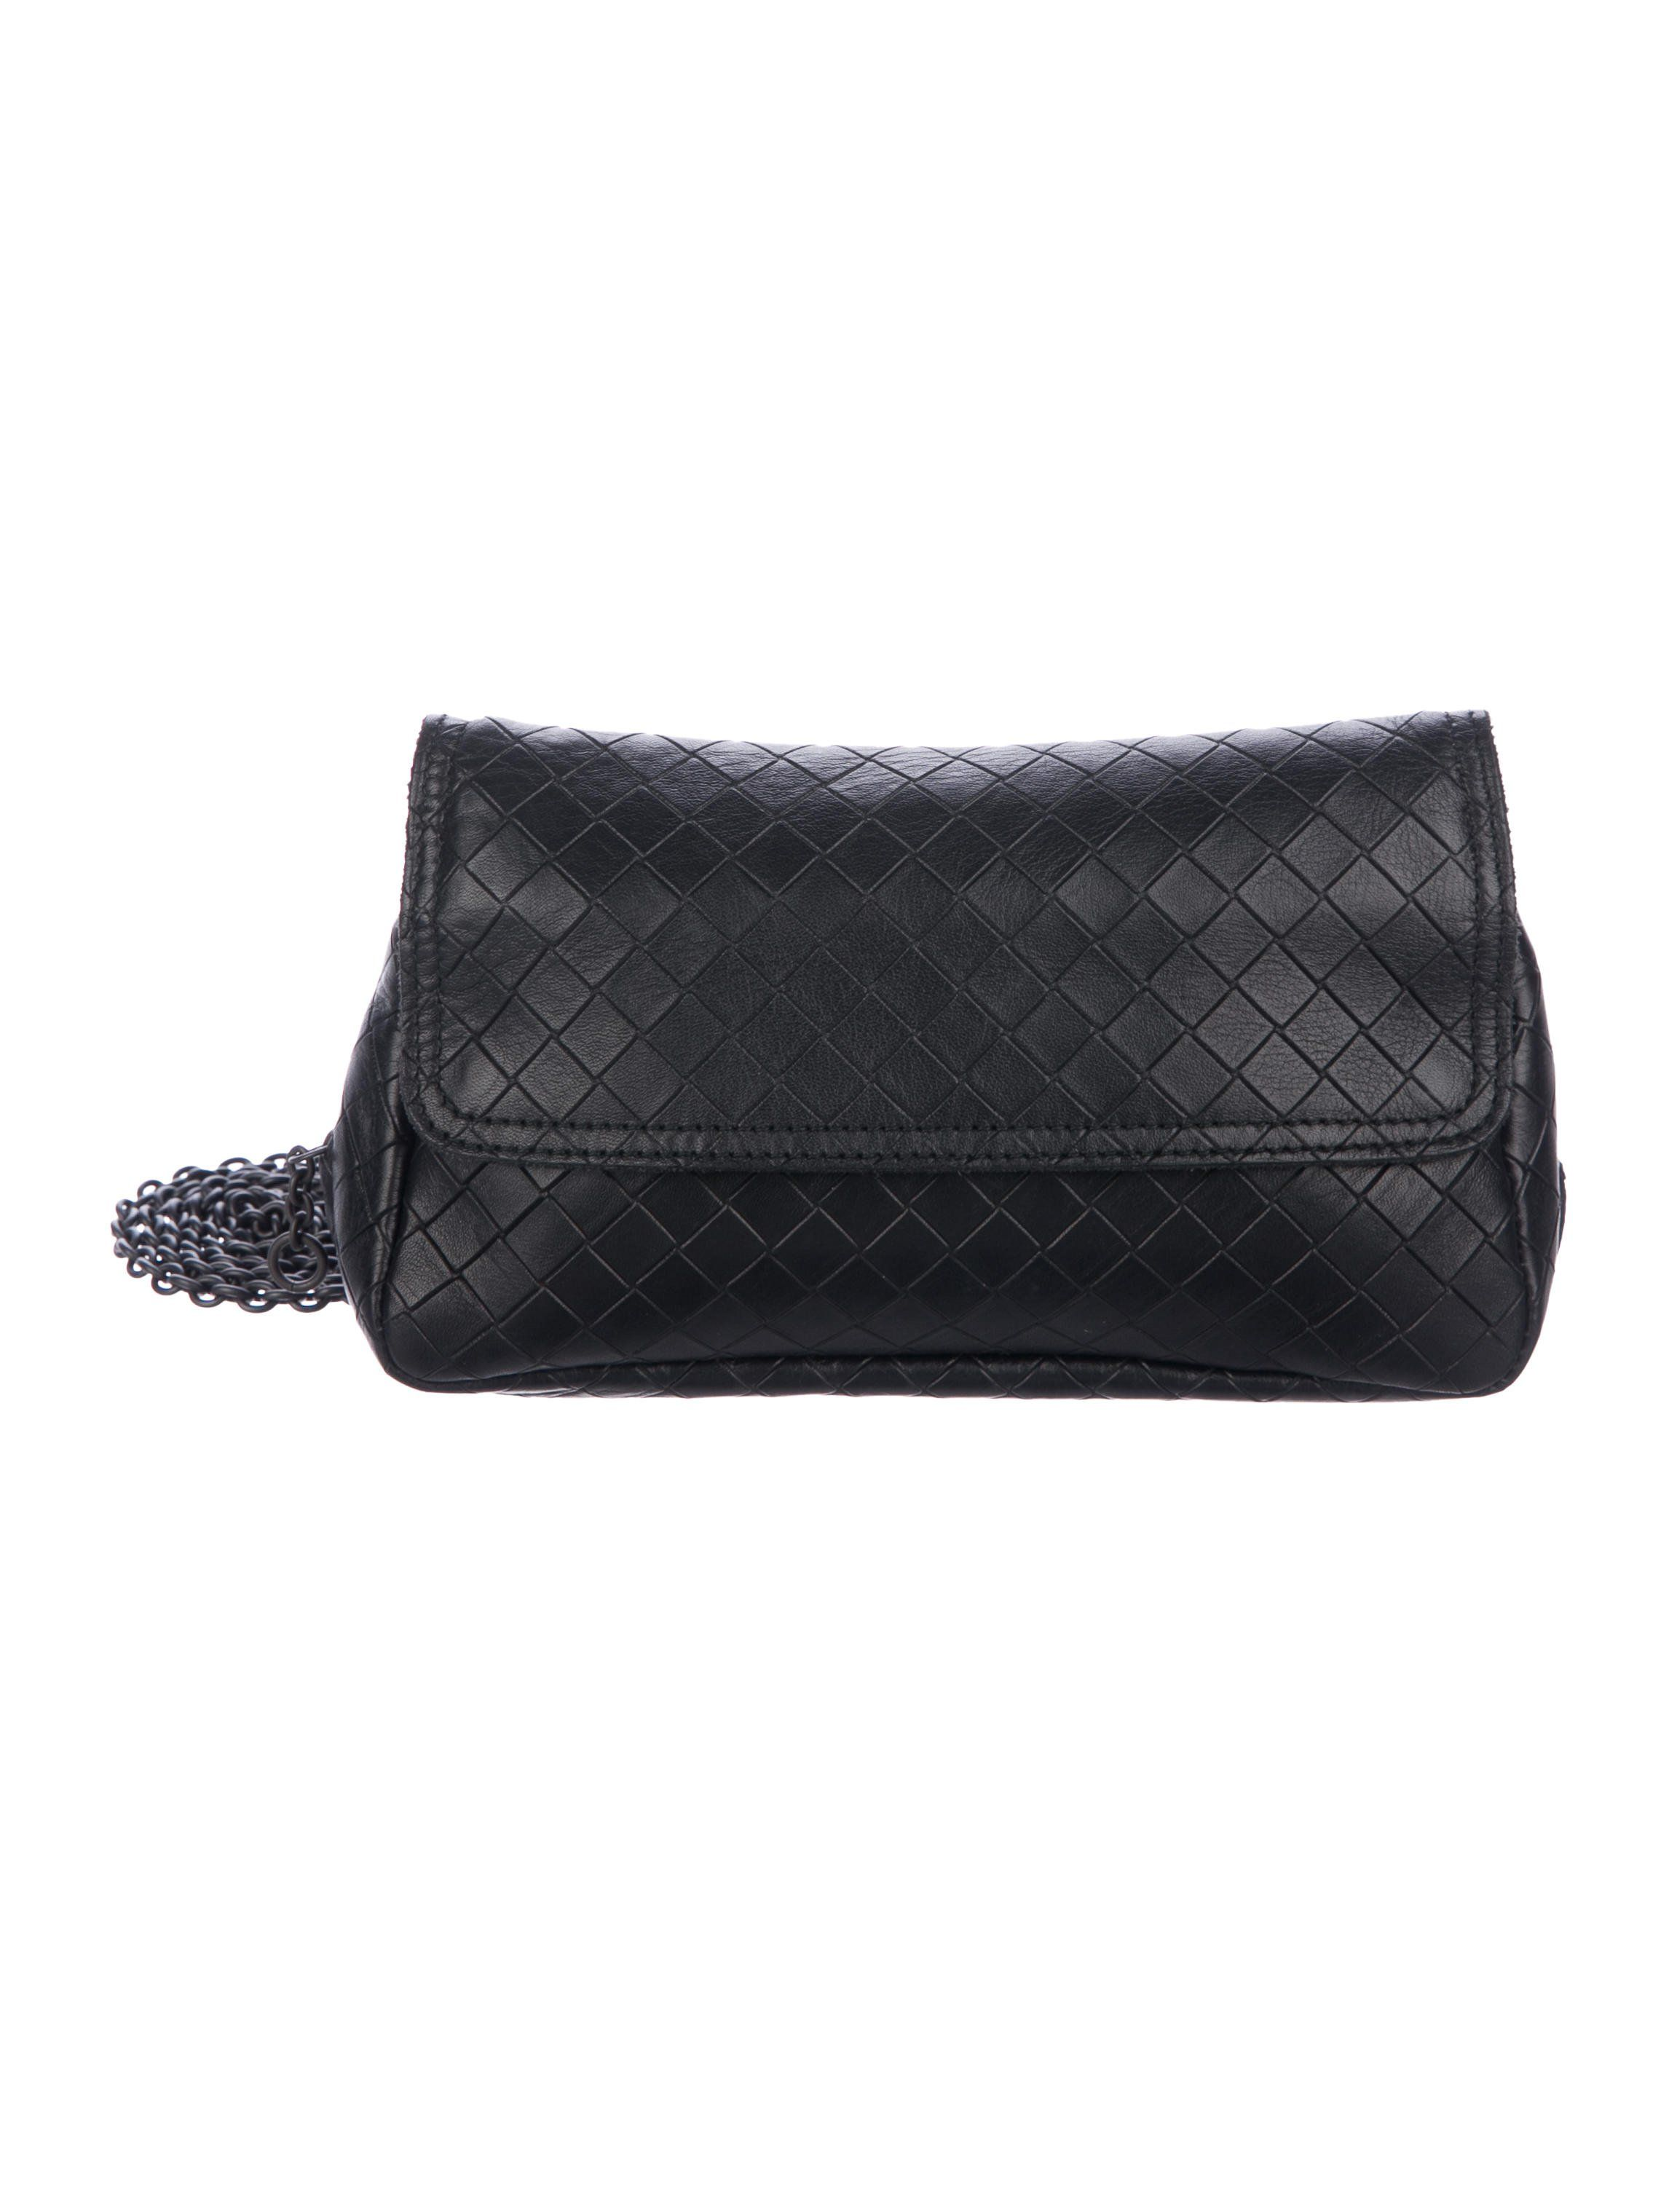 140597e71c5 Black Intrecciato-embossed leather Bottega Veneta Messenger bag with  gunmetal hardware, single detachable chain-link shoulder strap, single  exterior zip ...